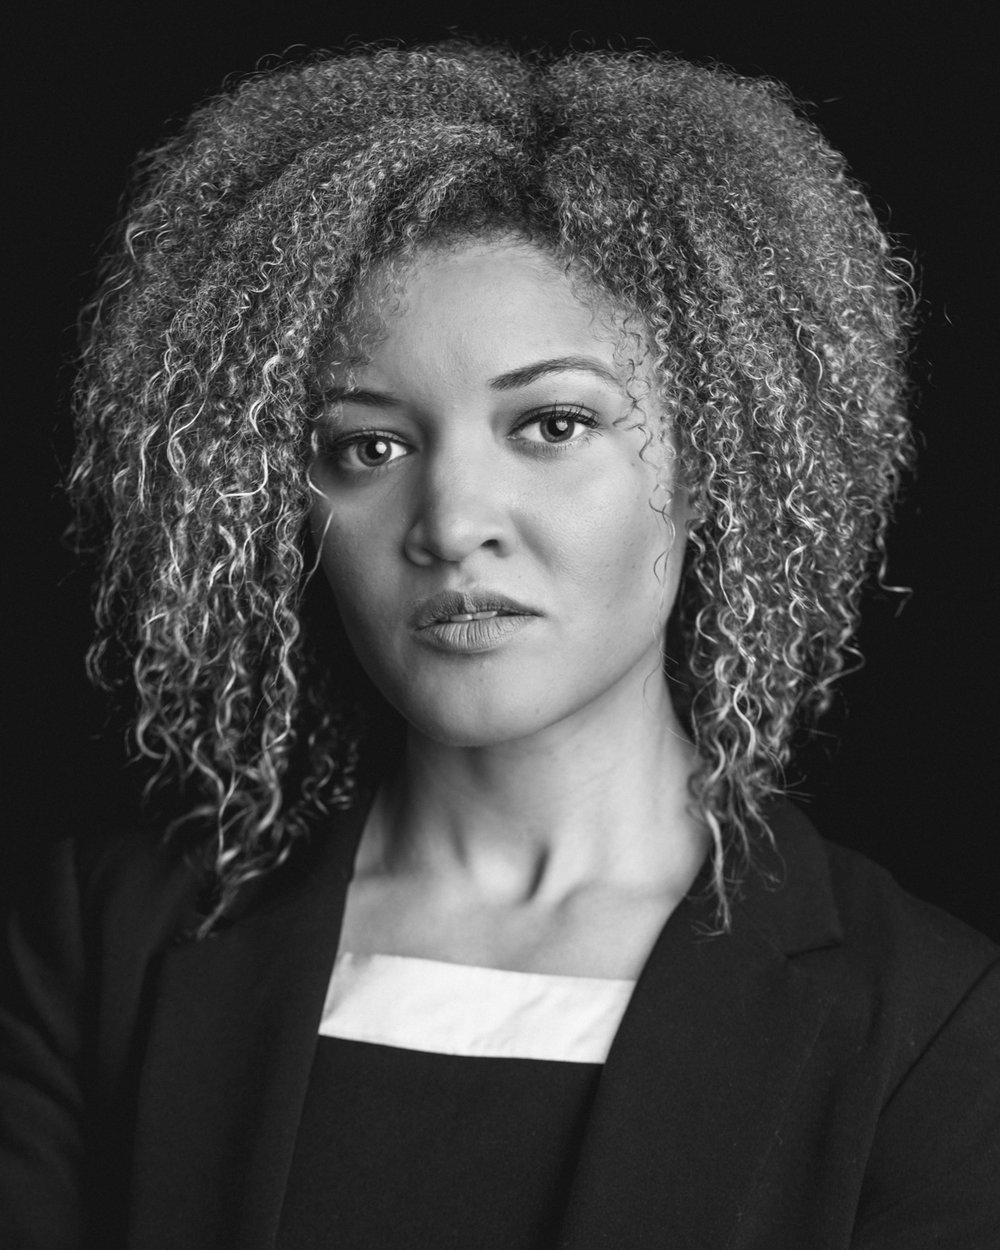 Sheena Jackson EDITS - WEB-2402-2.jpg